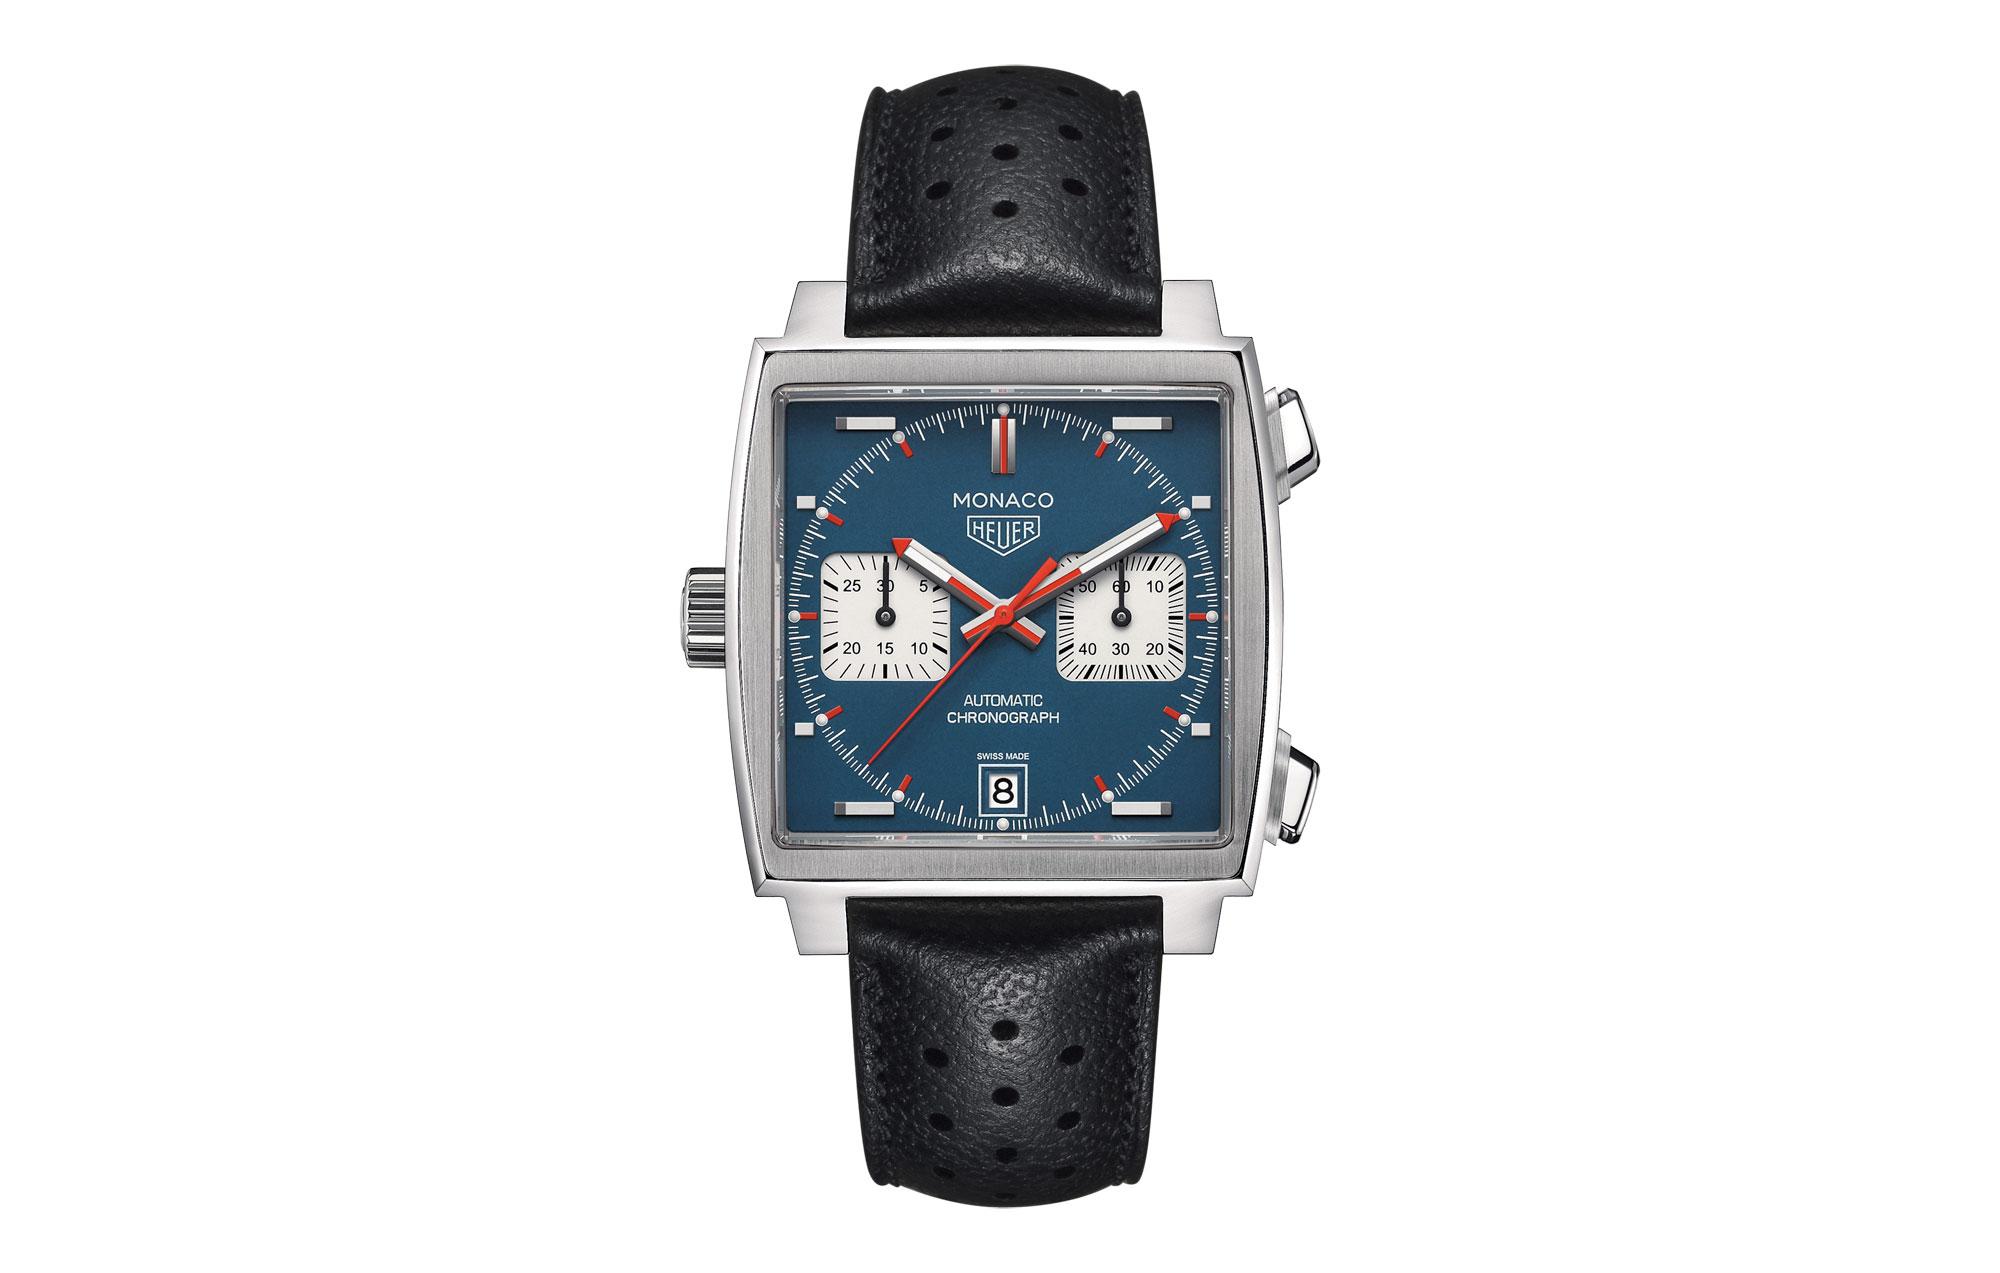 TAG Heuer Monaco - Calibre 11 Automatic Chronograph